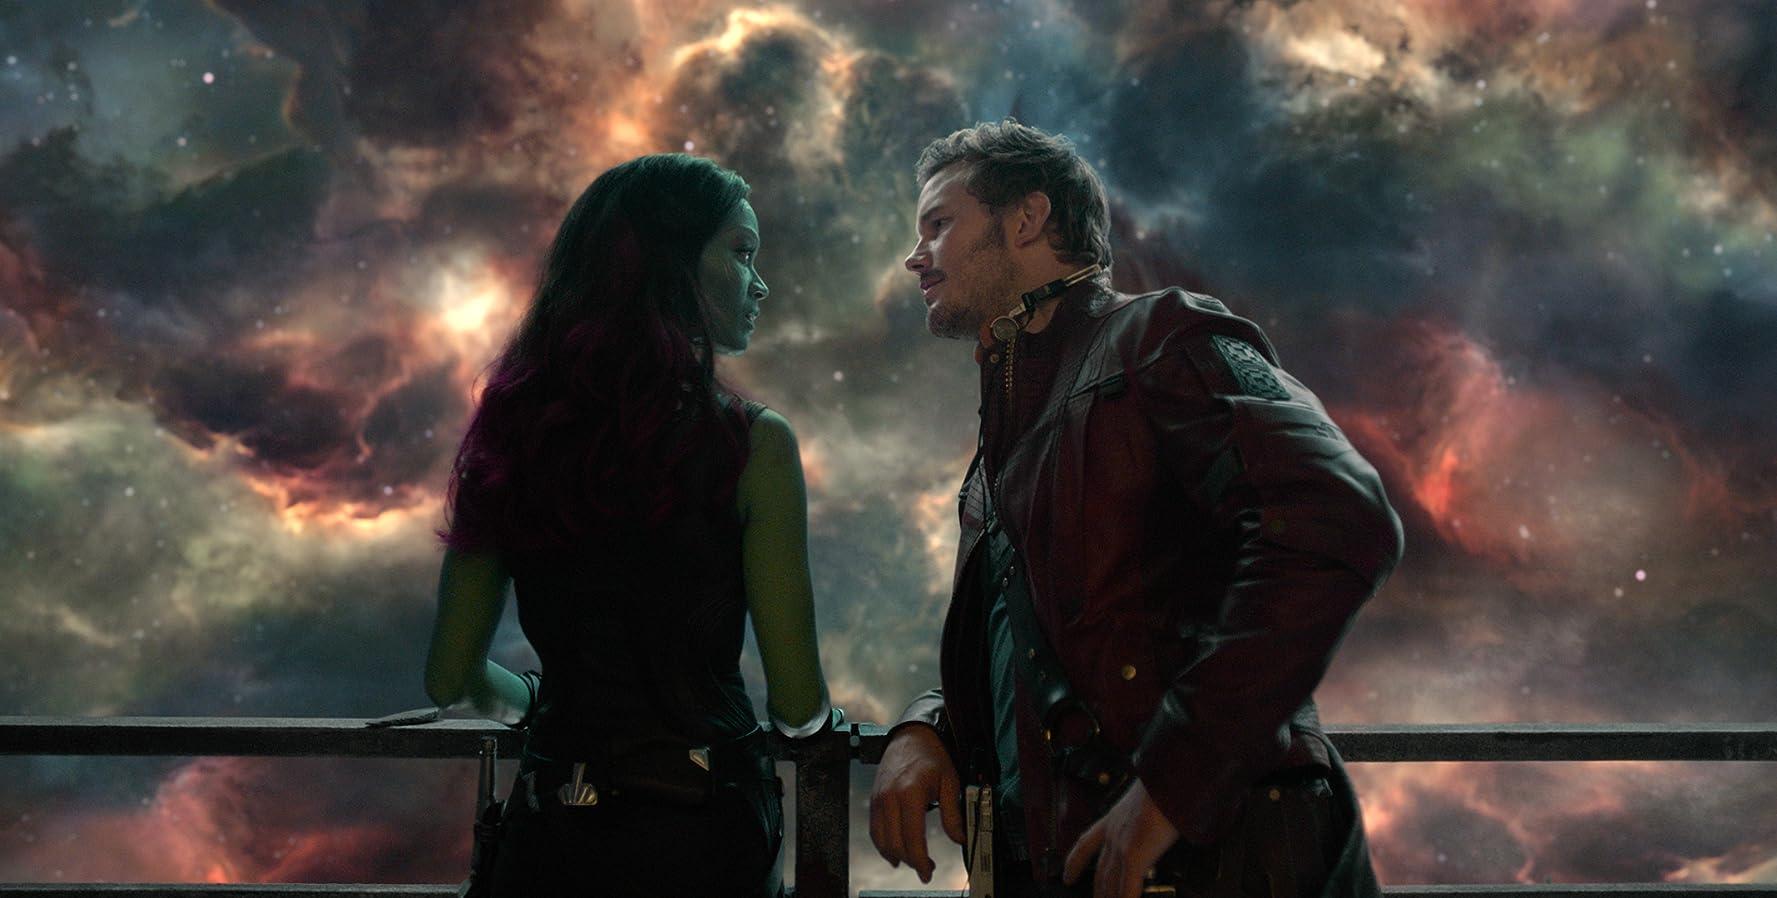 Chris Pratt and Zoe Saldana in Guardians of the Galaxy (2014)